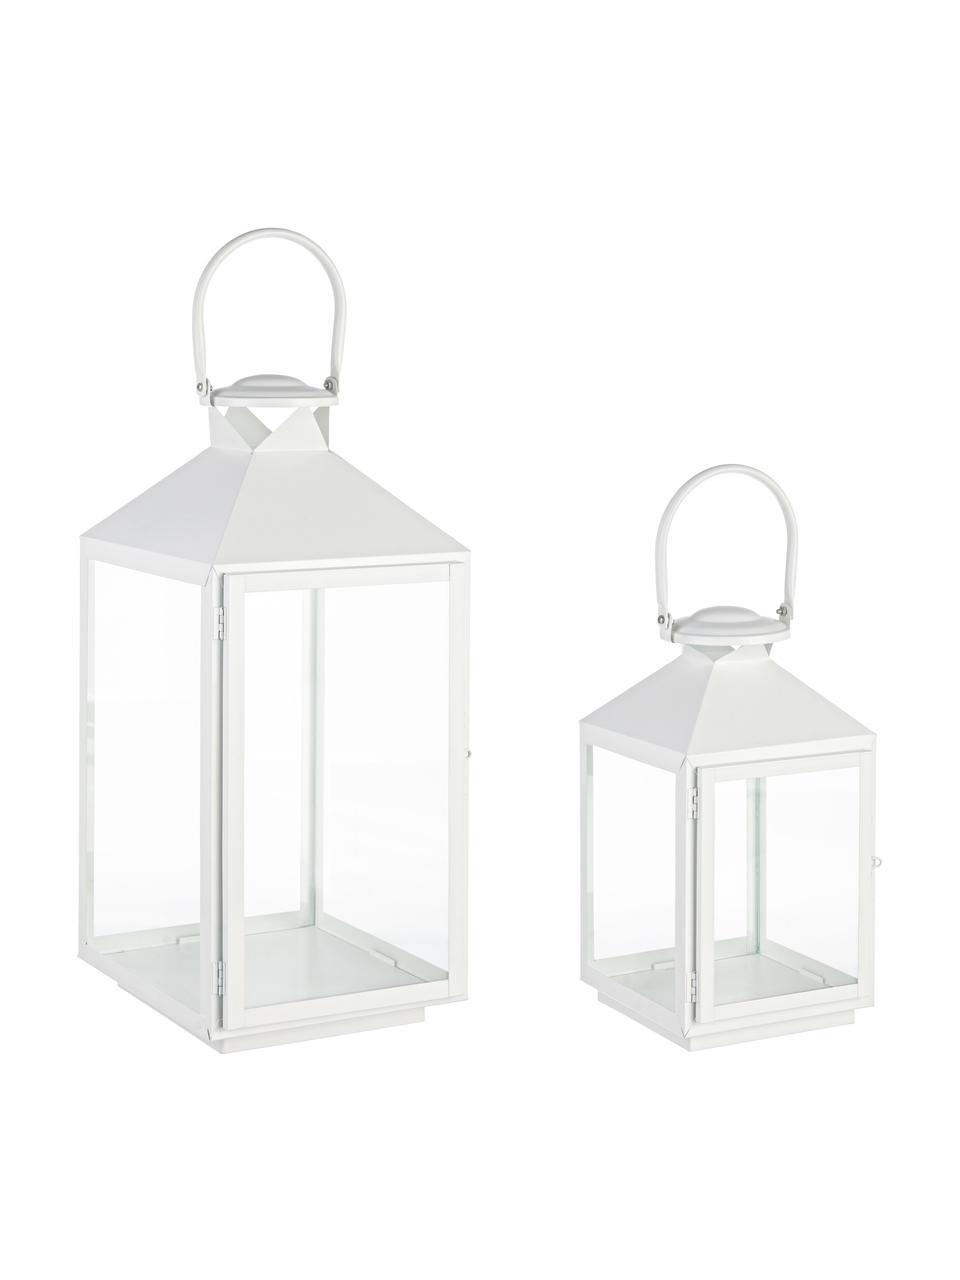 Set 2 lanterne Classy, Struttura: metallo rivestito, Trasparente, bianco, Set in varie misure